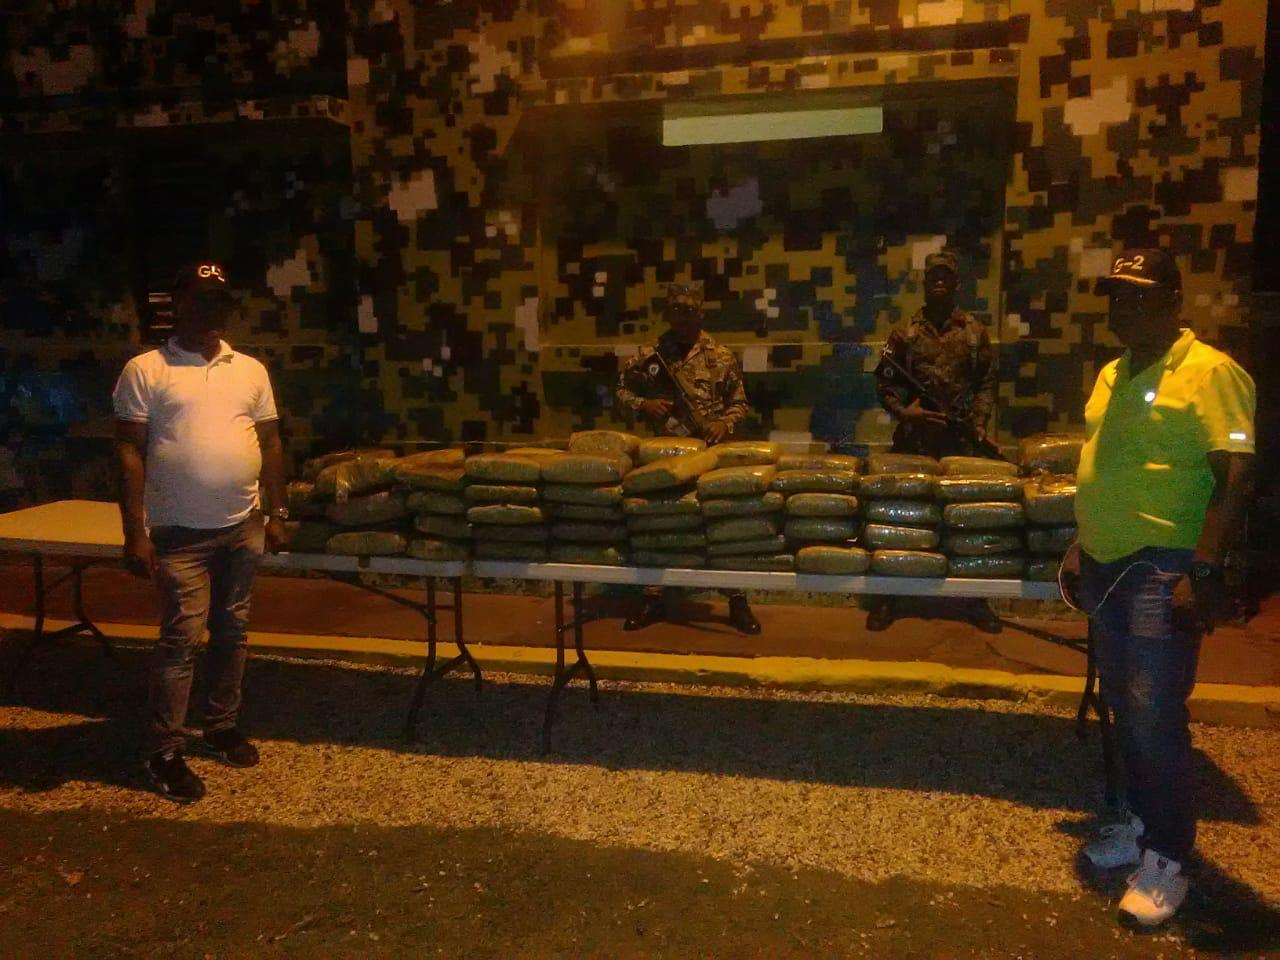 Apresan haitiano con 103 paquetes de marihuana